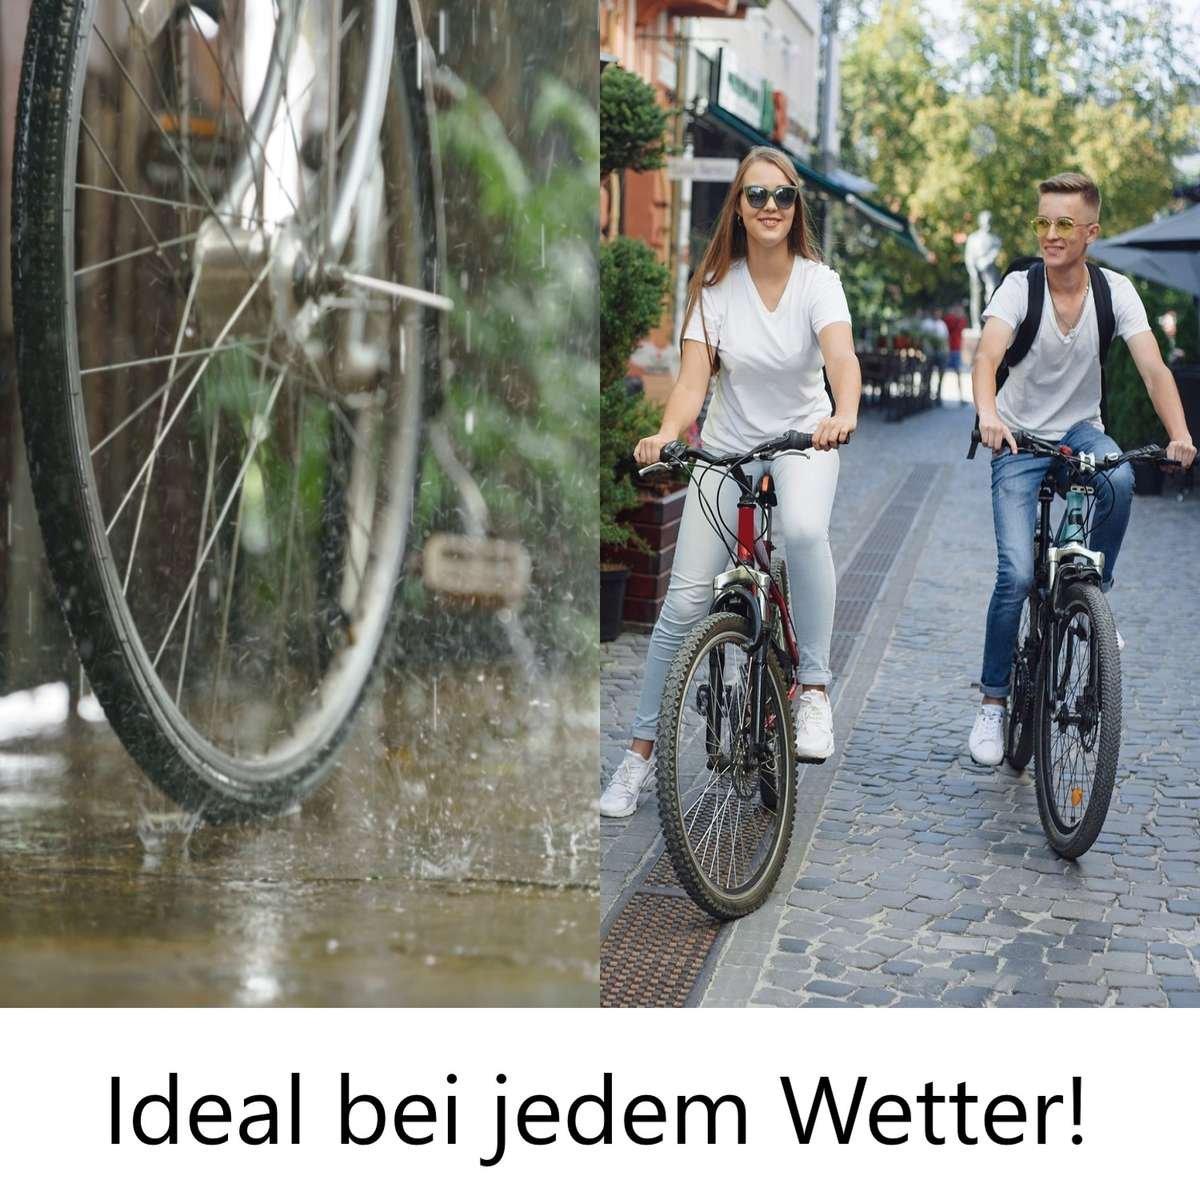 Top Korbüberzug Regen online bestellen. Fahrradkorb Regenschutz in premium Qualität kaufen.